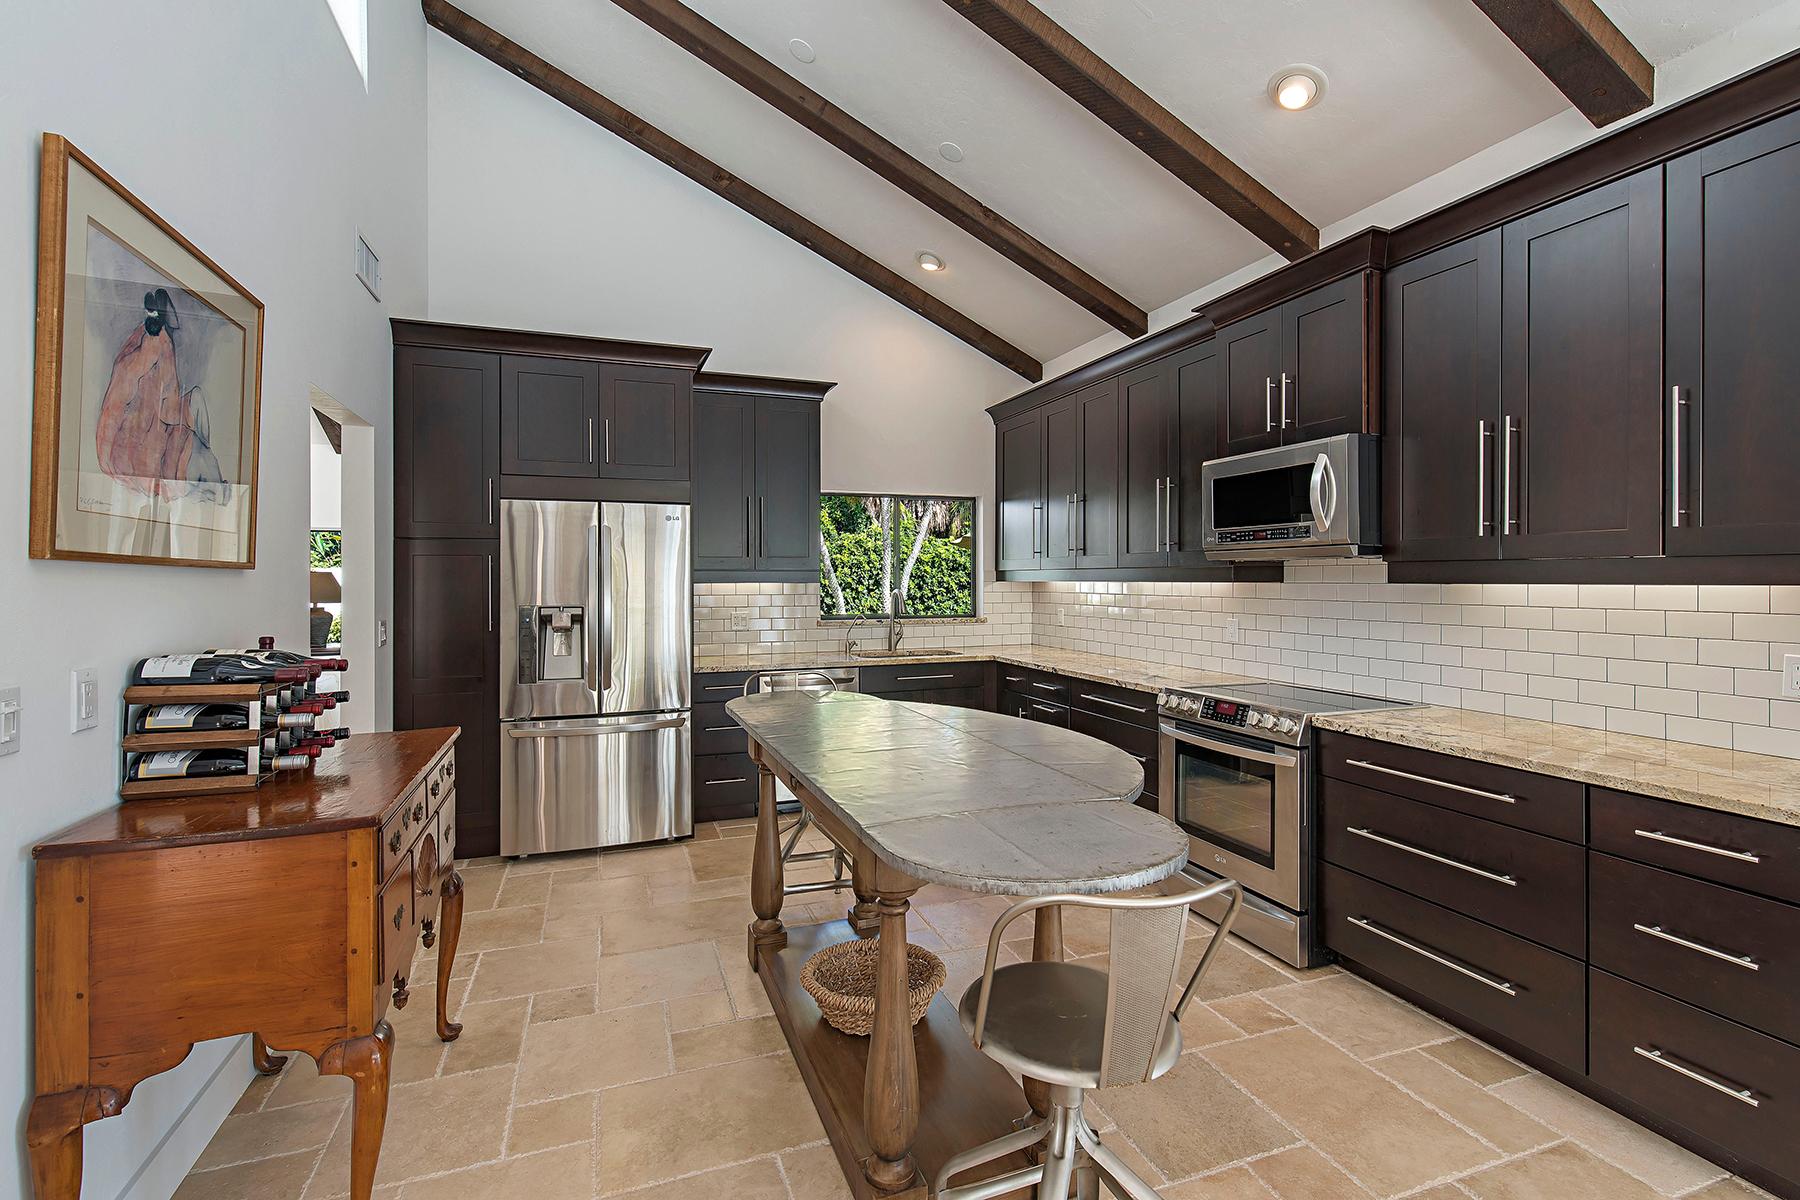 Property For Sale at 561 Tierra Mar Ln , Naples, FL 34108